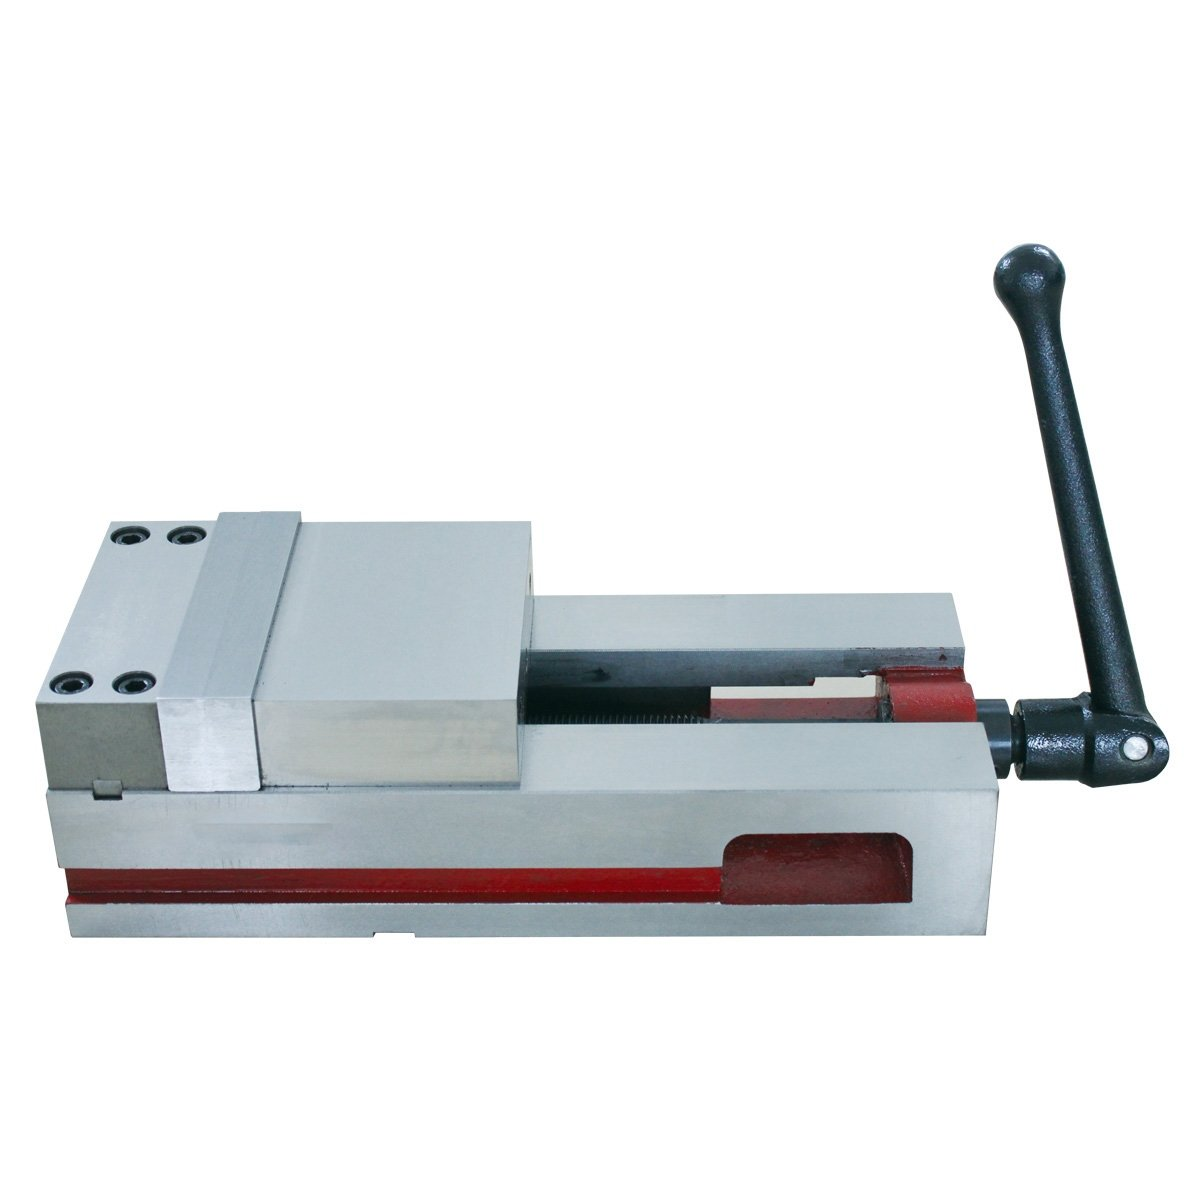 HHIP 3900-0171 5'' Super-Lock Vise for NC/CNC Machines, 13.19''